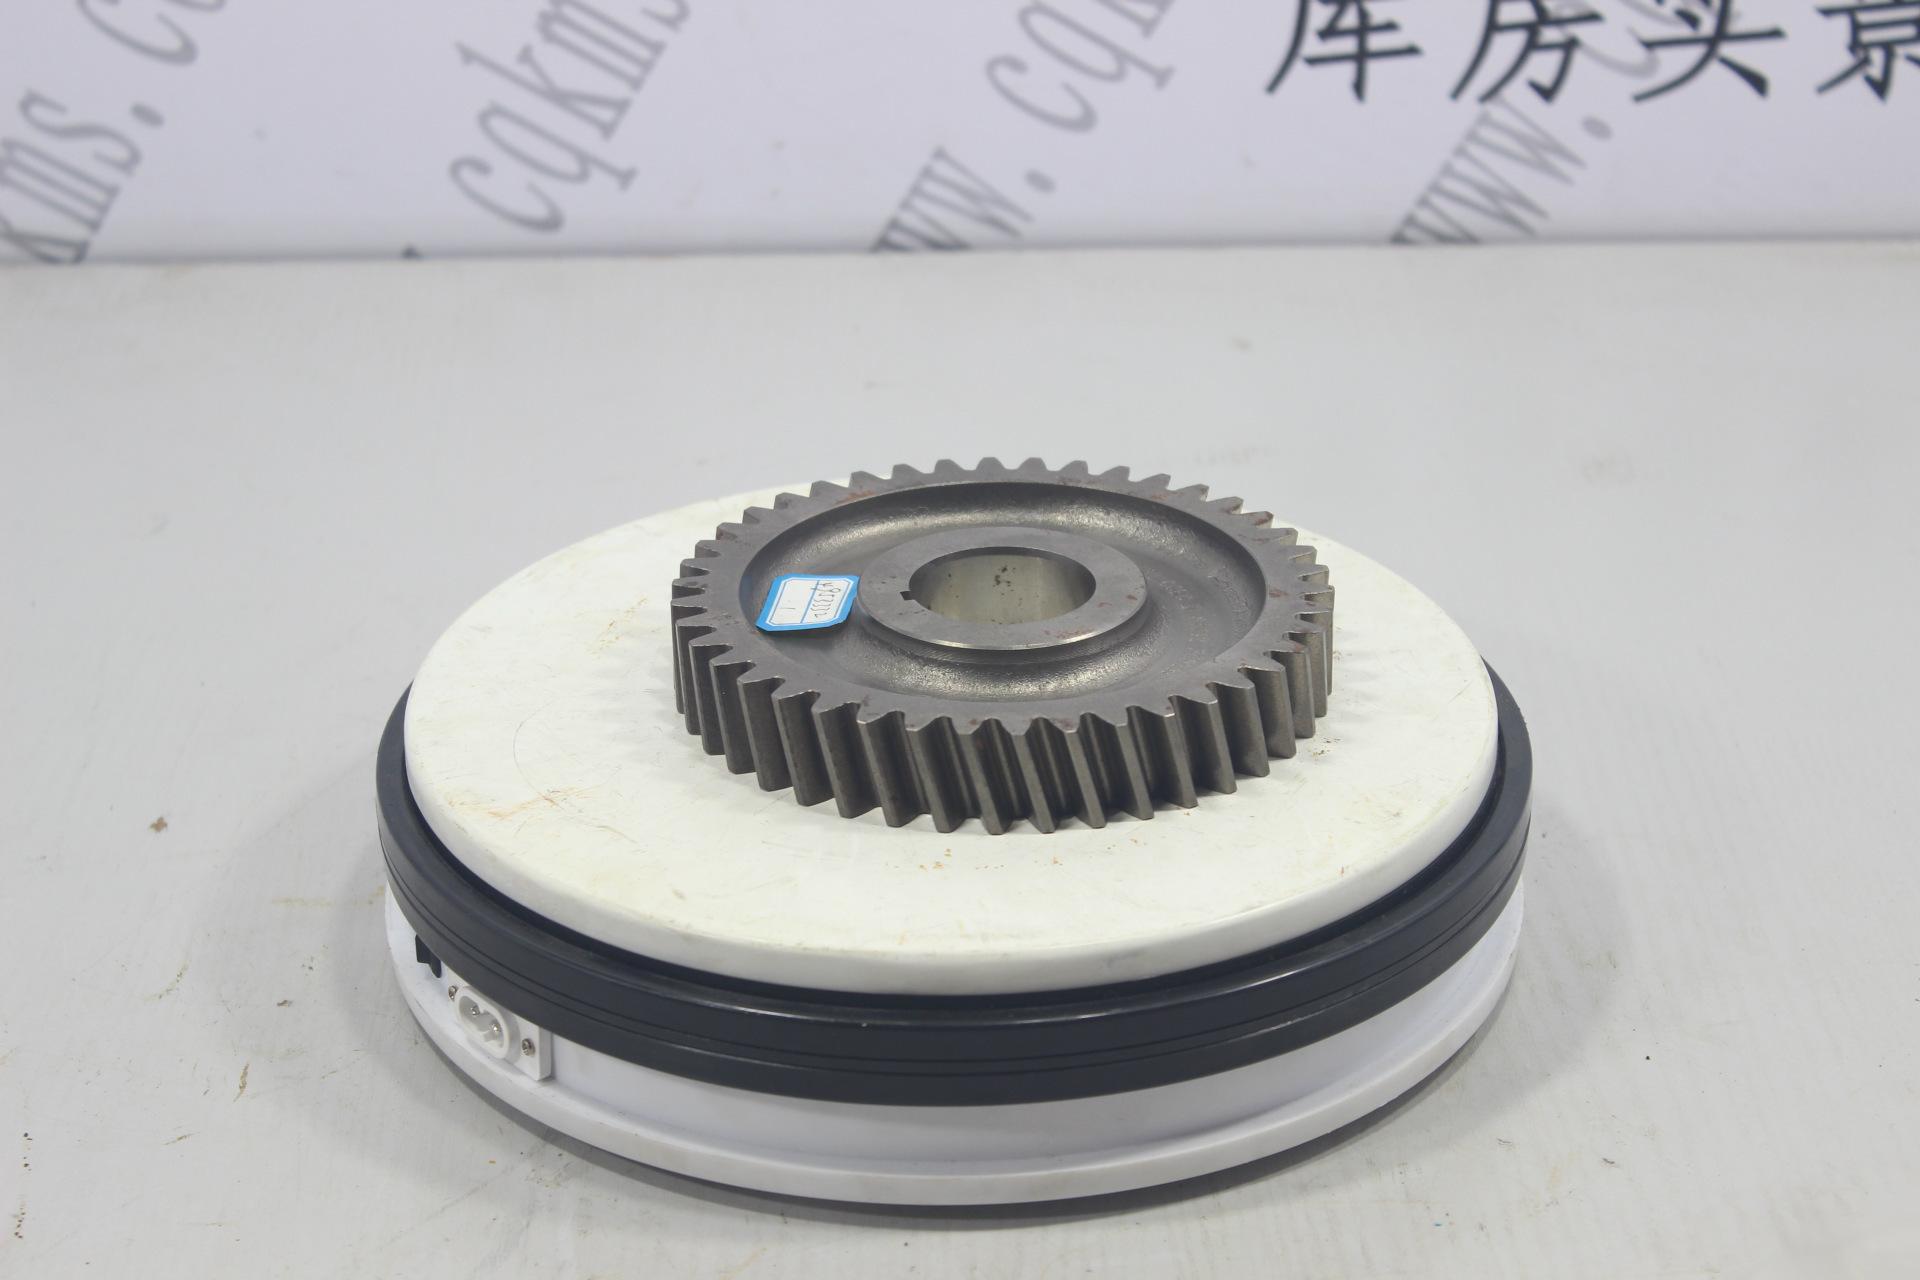 kms00513-207253-辅助传动齿轮图片3